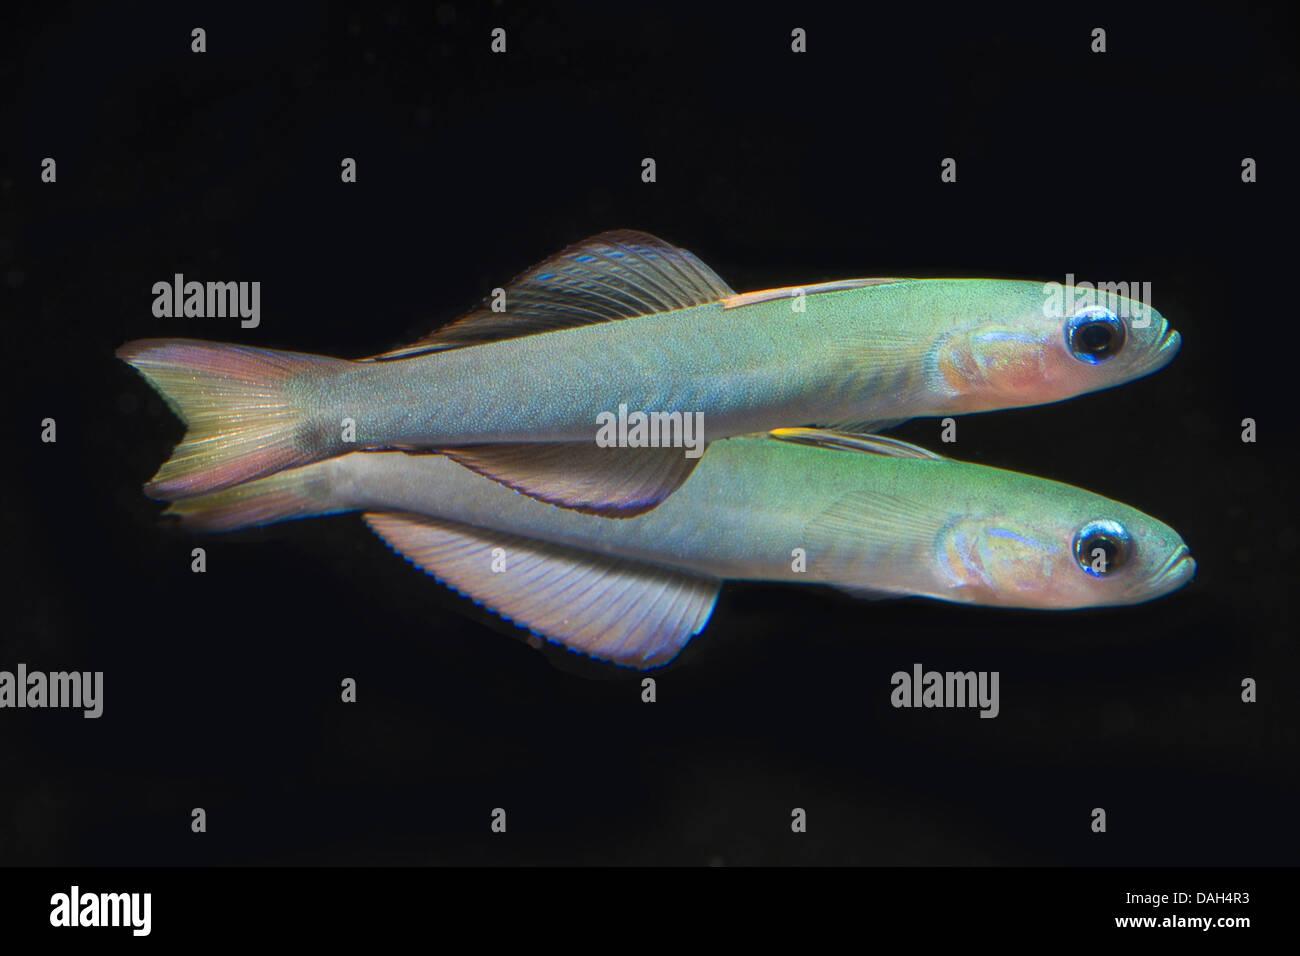 scissor-tailed goby, blackfin gudgeon, blackfin dartfish (Ptereleotris evides), two dartfishes swimming next to - Stock Image